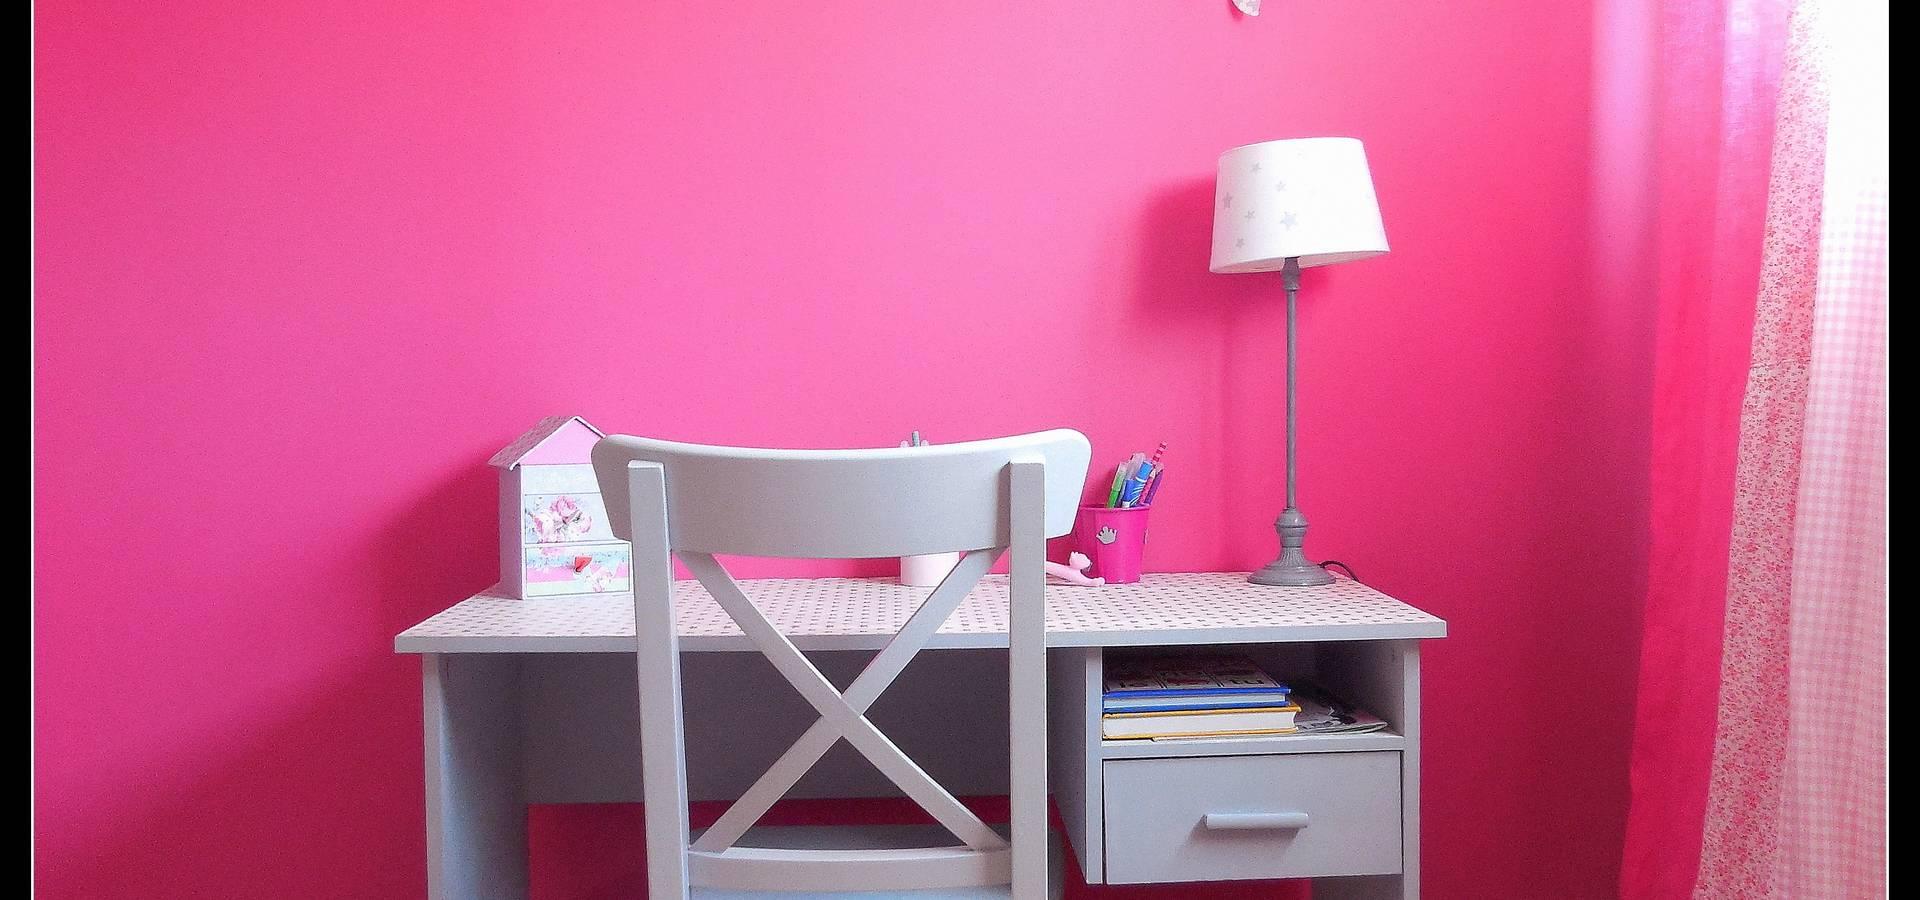 Chambre de jeune fille chambre de jeune fille peinture for Peinture chambre fille rose violet